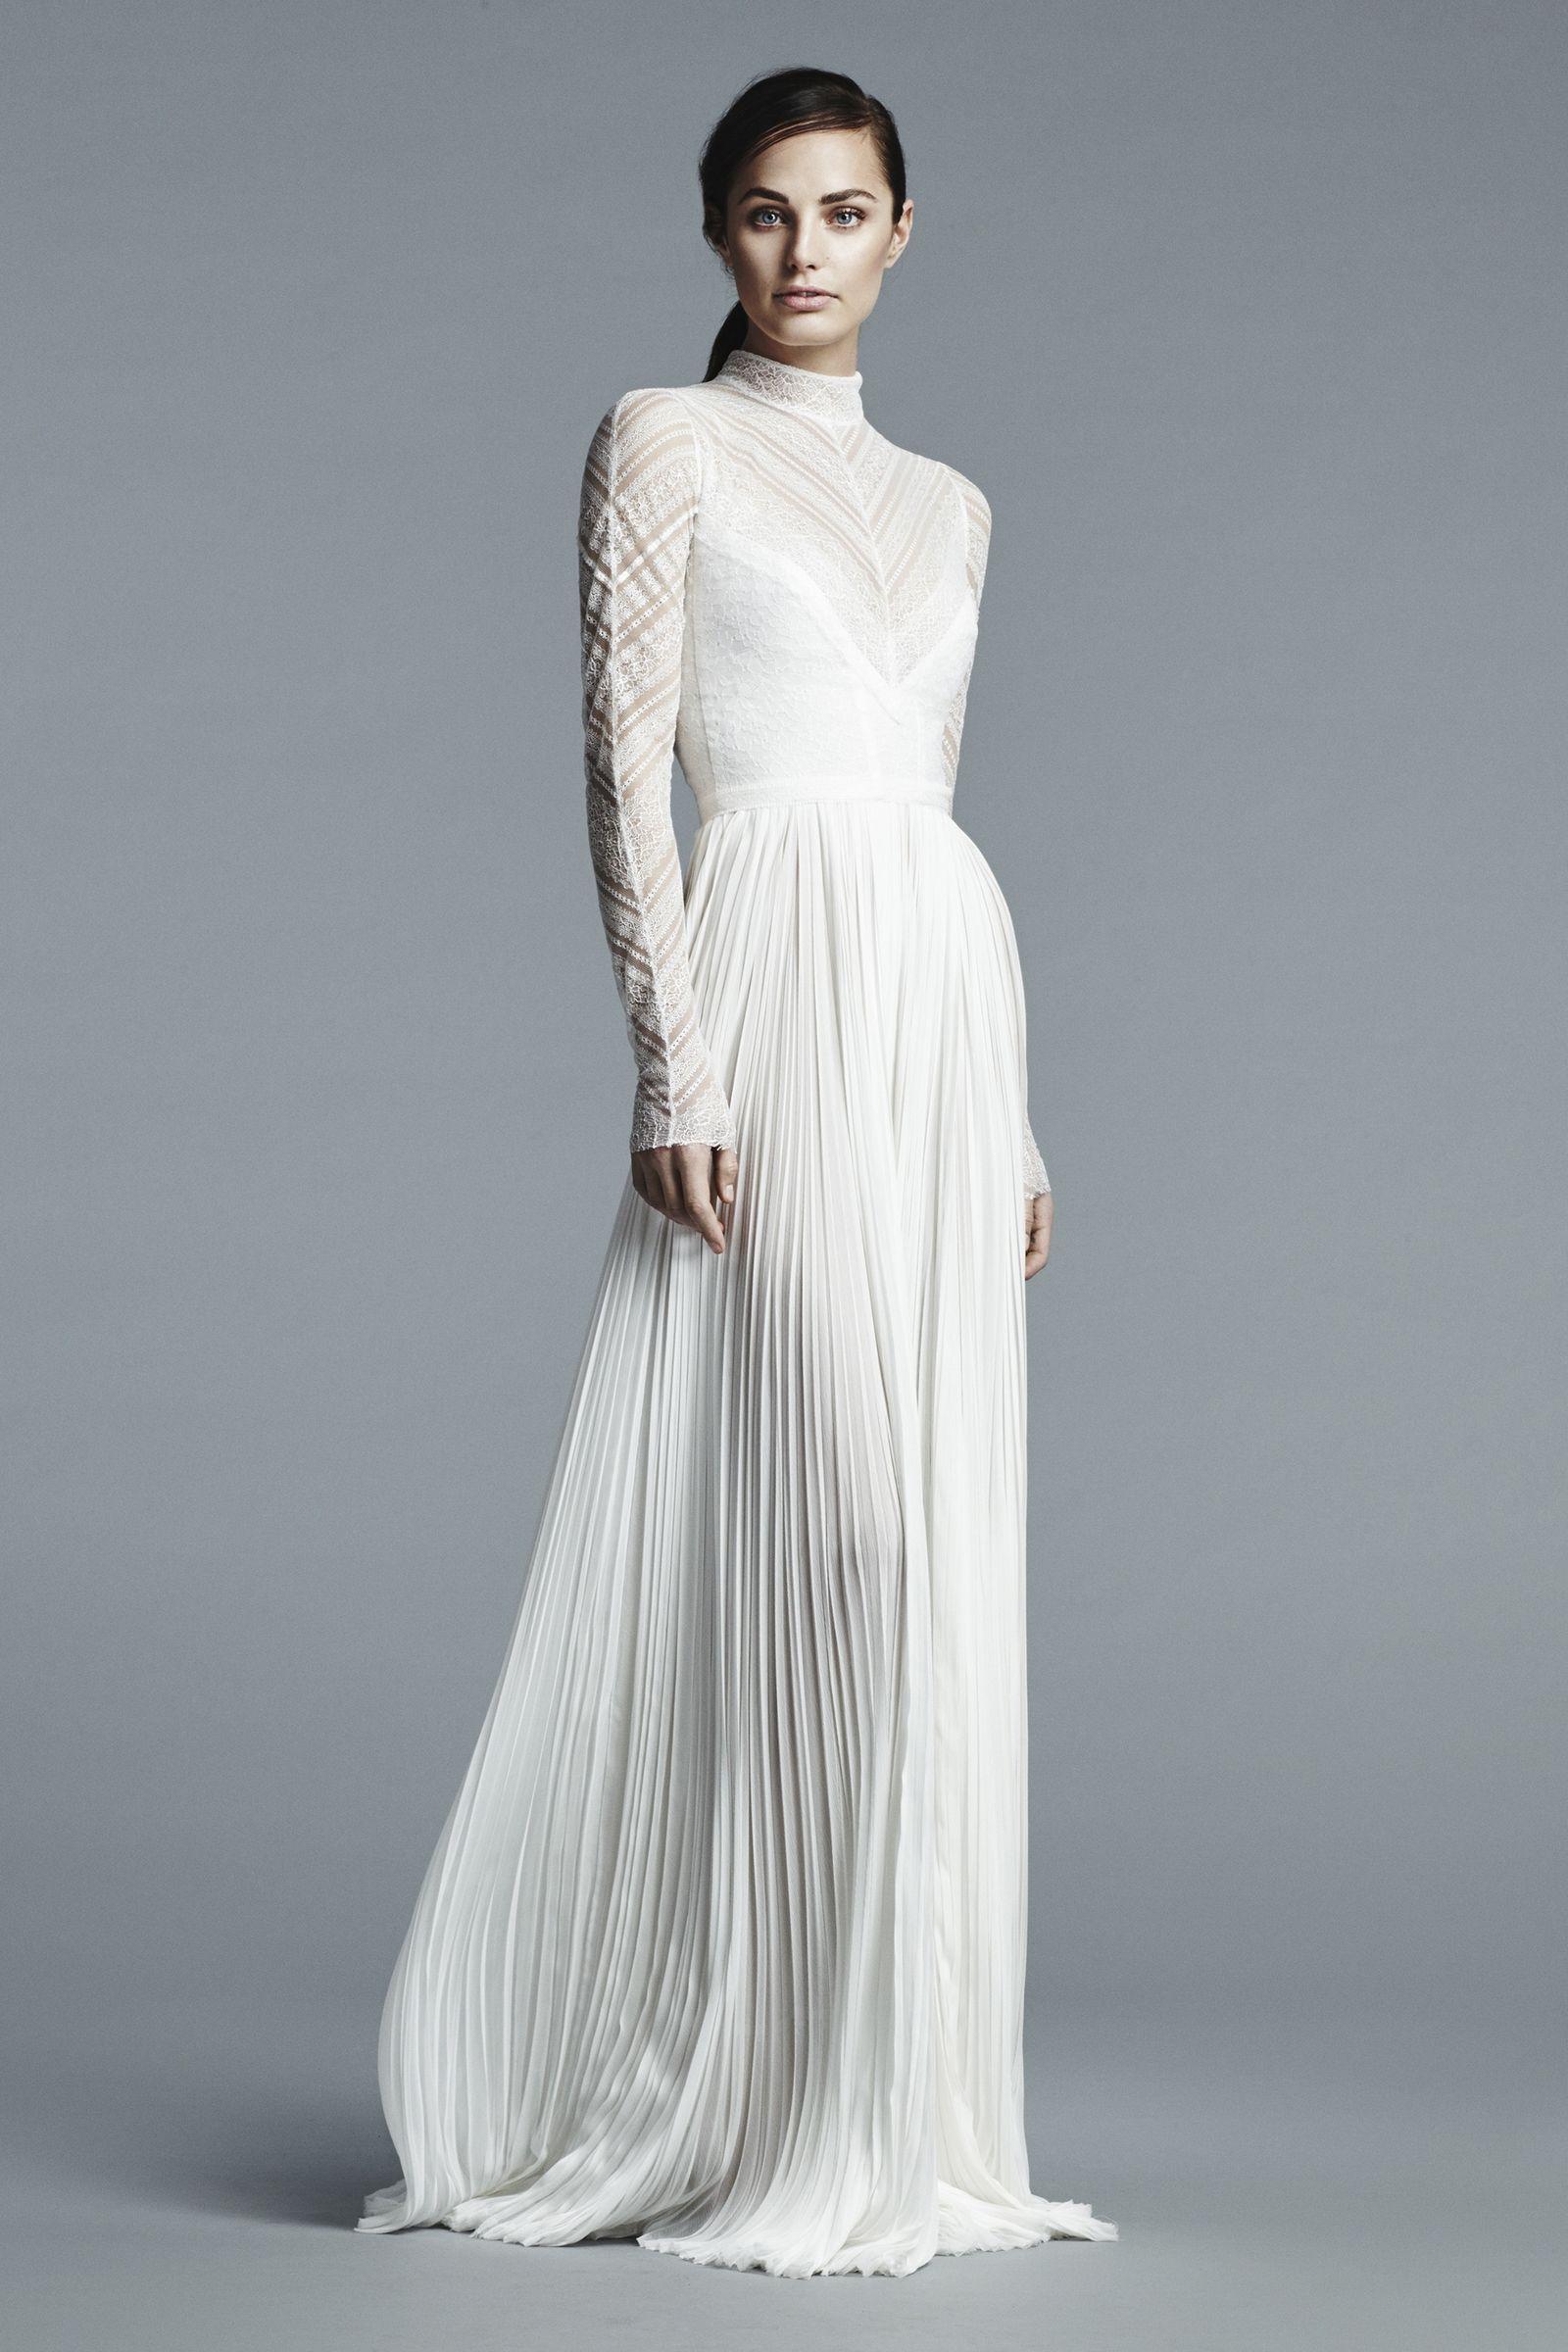 effortless looks for the boho bride wedding dress weddings